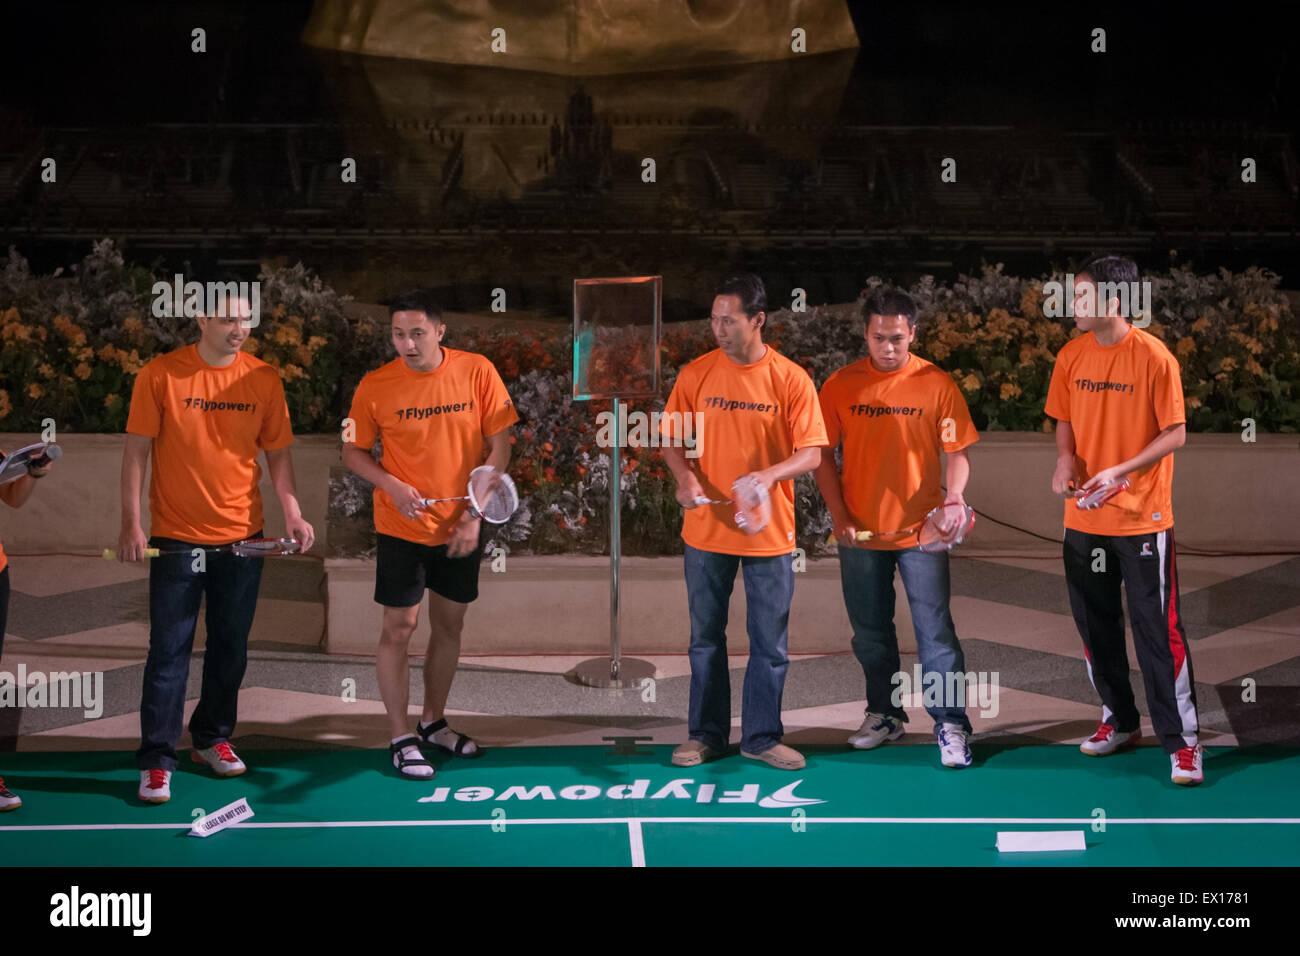 Légendes de badminton indonésien Haryanto Arbi, Ricky, Subagja Budiarto Sigit, Markis Kido et Hendra Setiawan Photo Stock